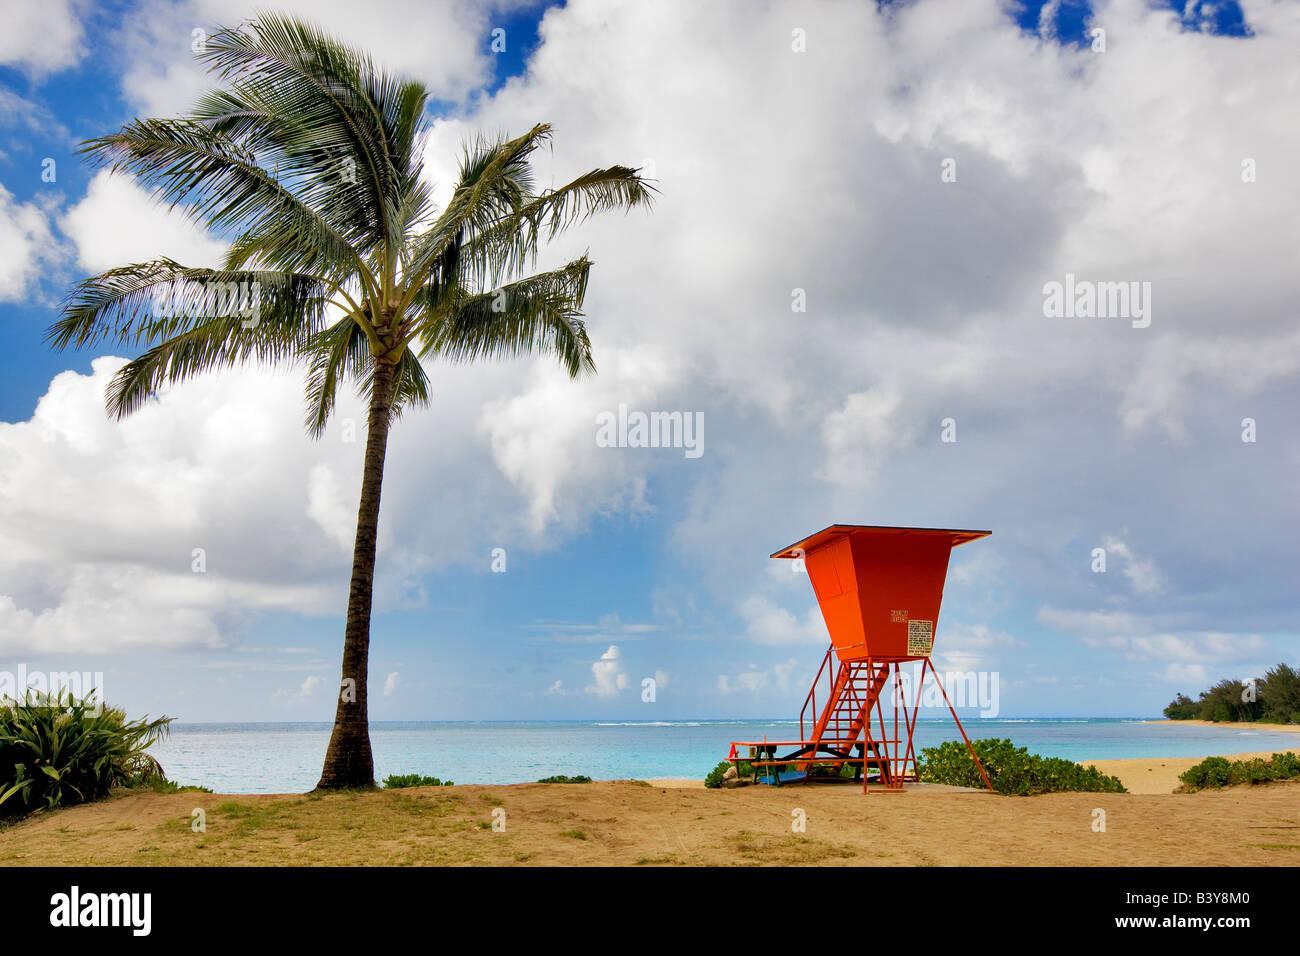 Haena Beach with lifegaurd tower Kauai Hawaii Stock Photo